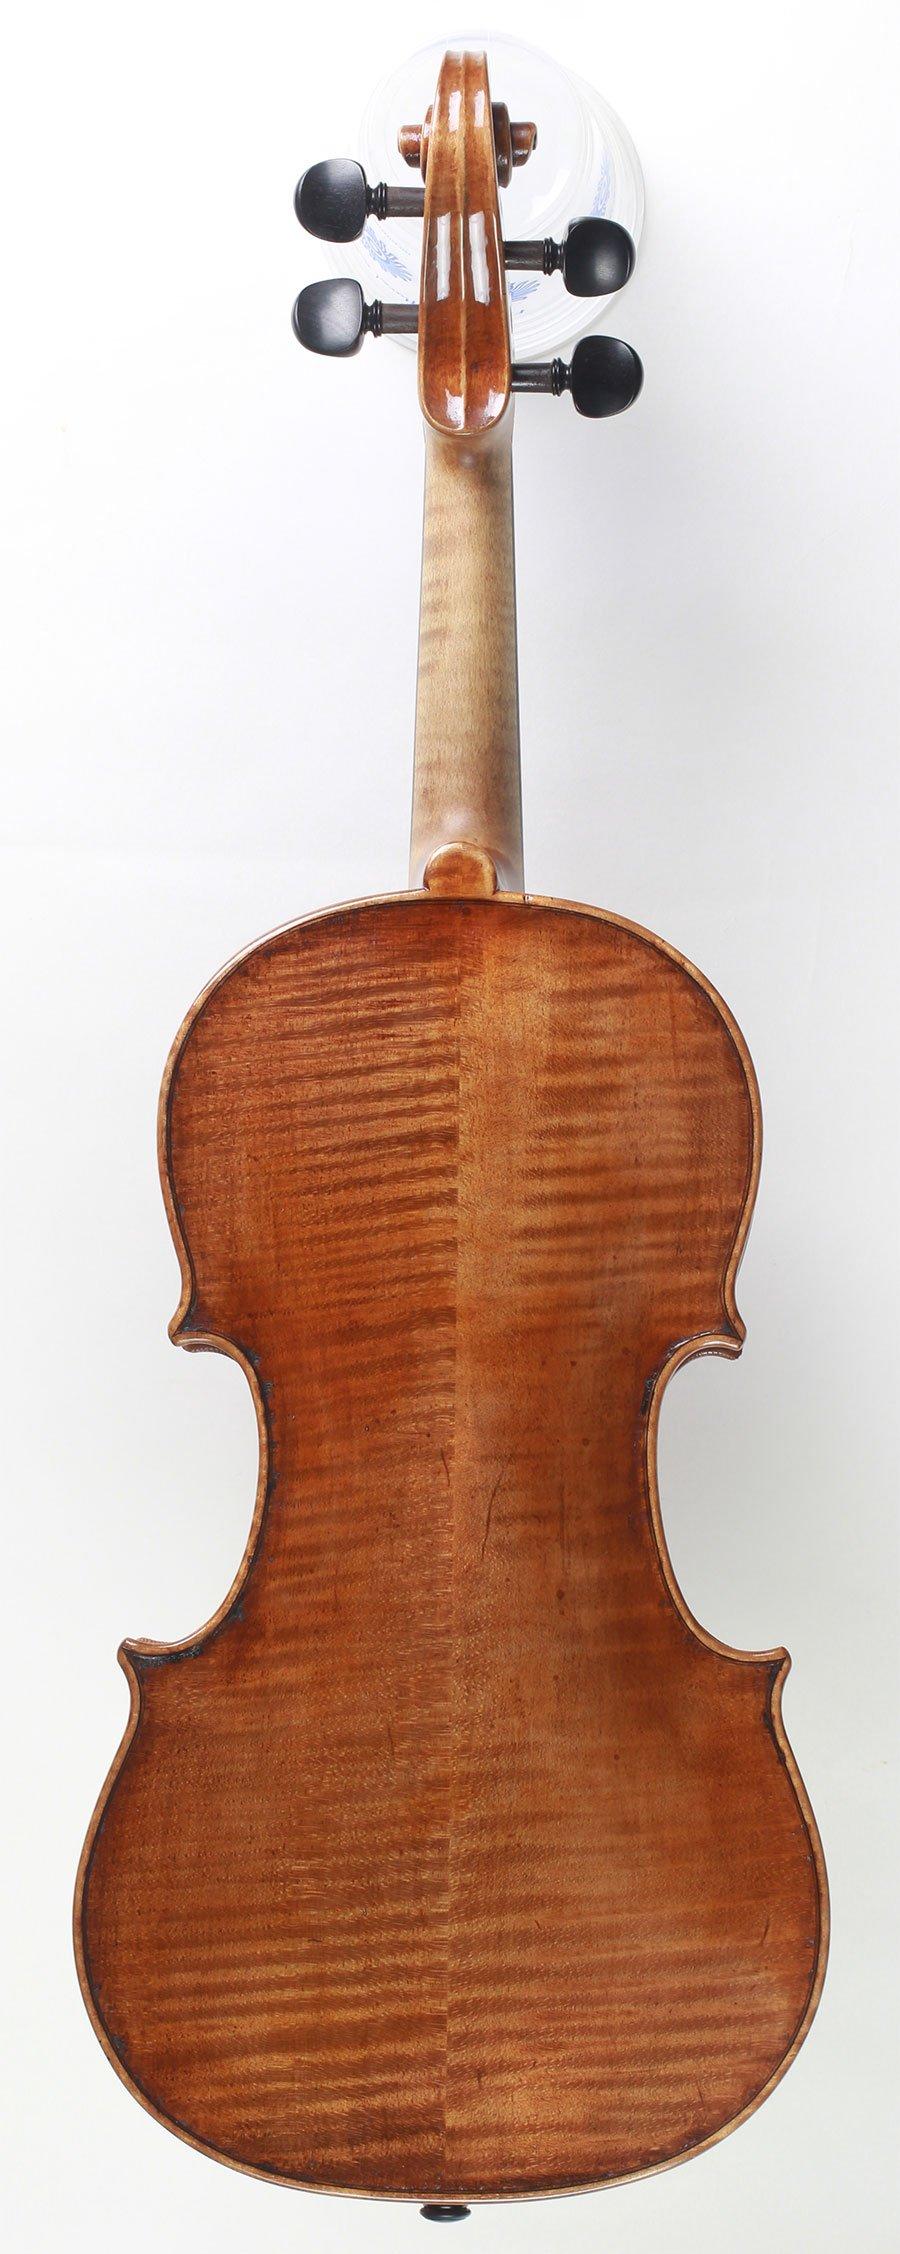 Violin for Professionals